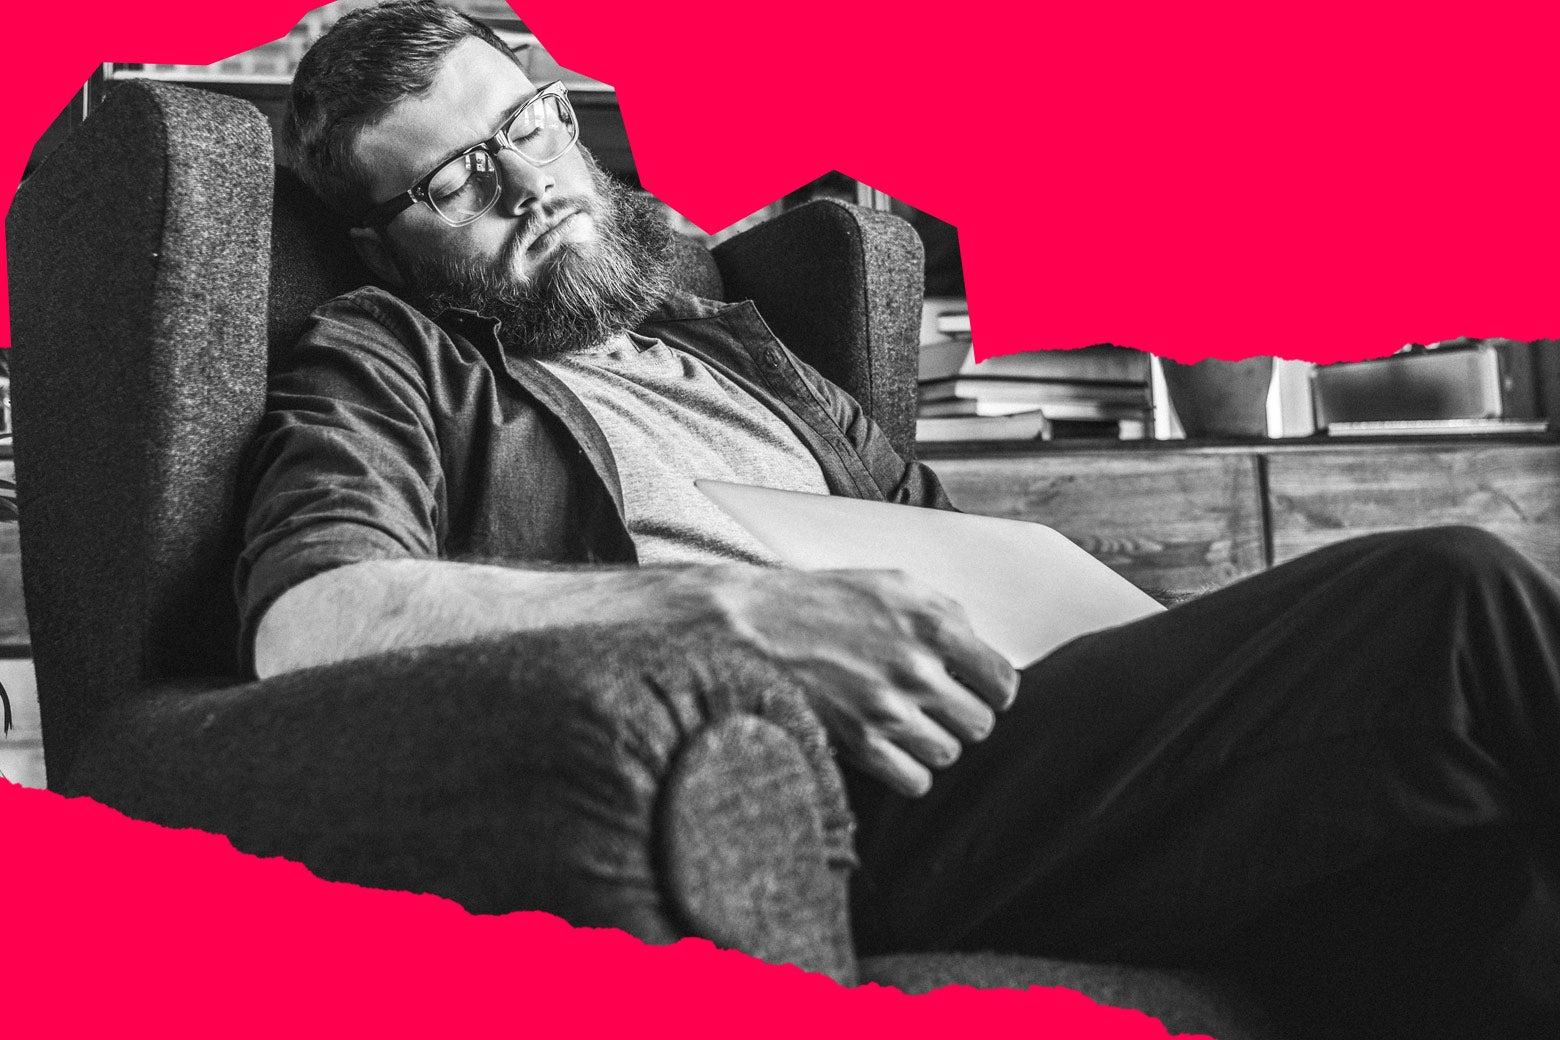 Man sleeping in armchair.